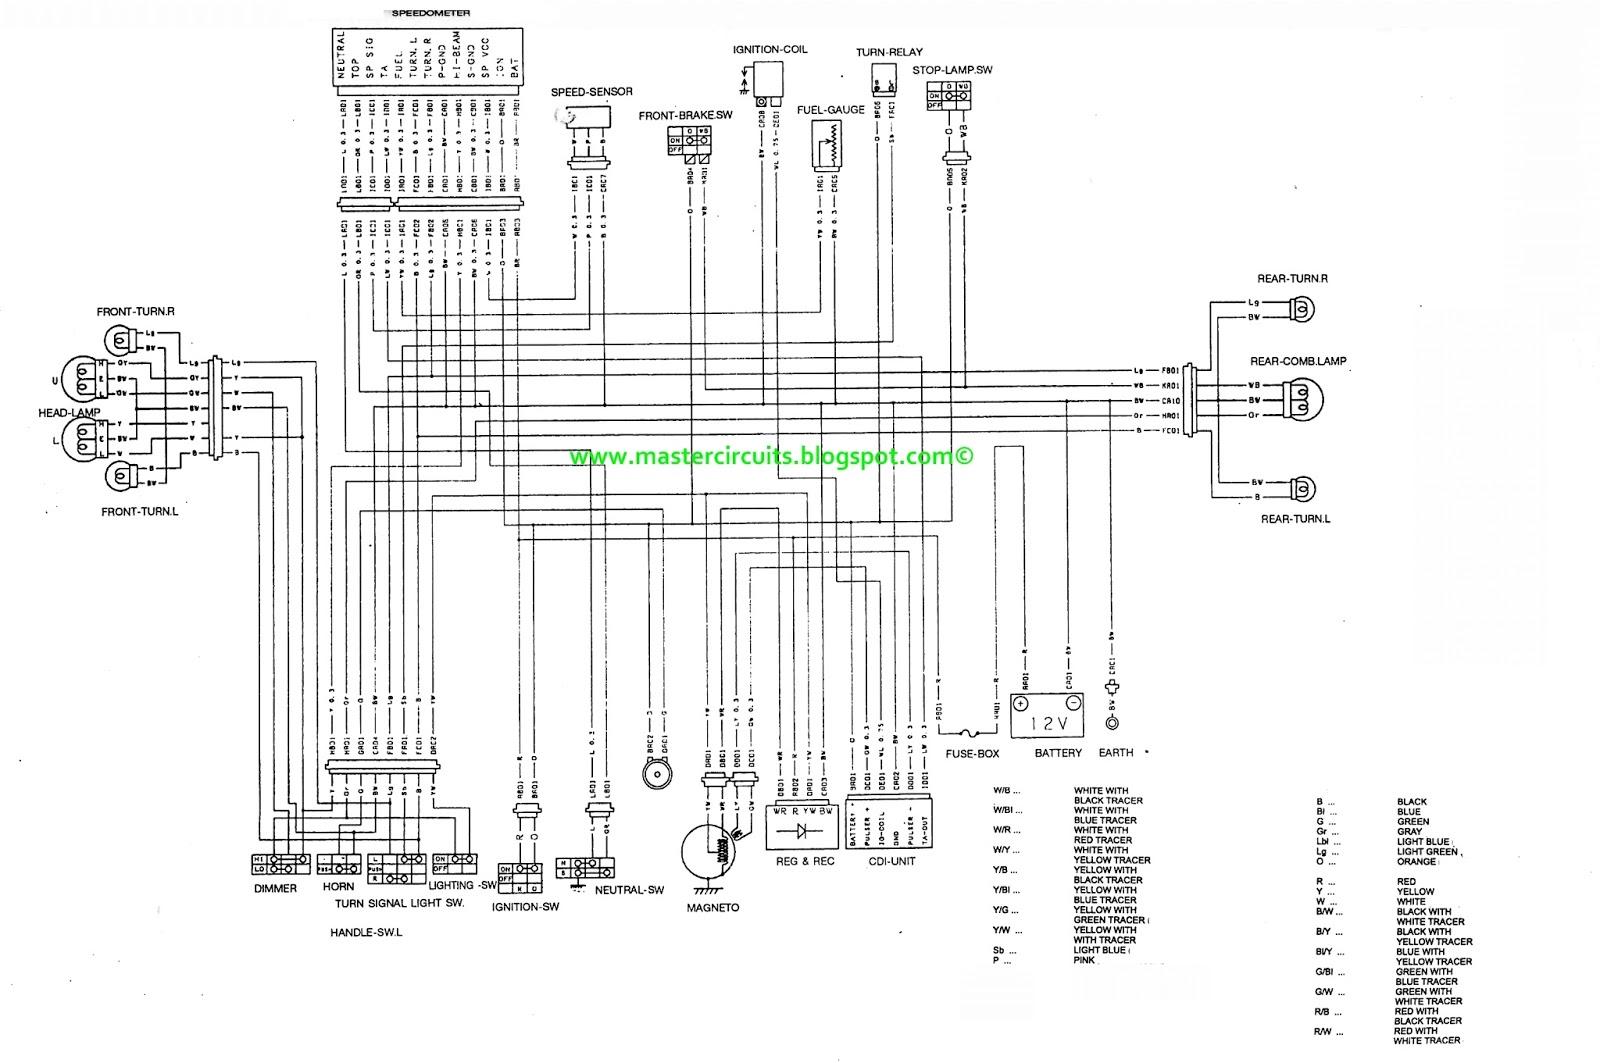 Unique Ultima Wiring Diagram Johnson Elaboration Great 01 3659 Photos Electrical